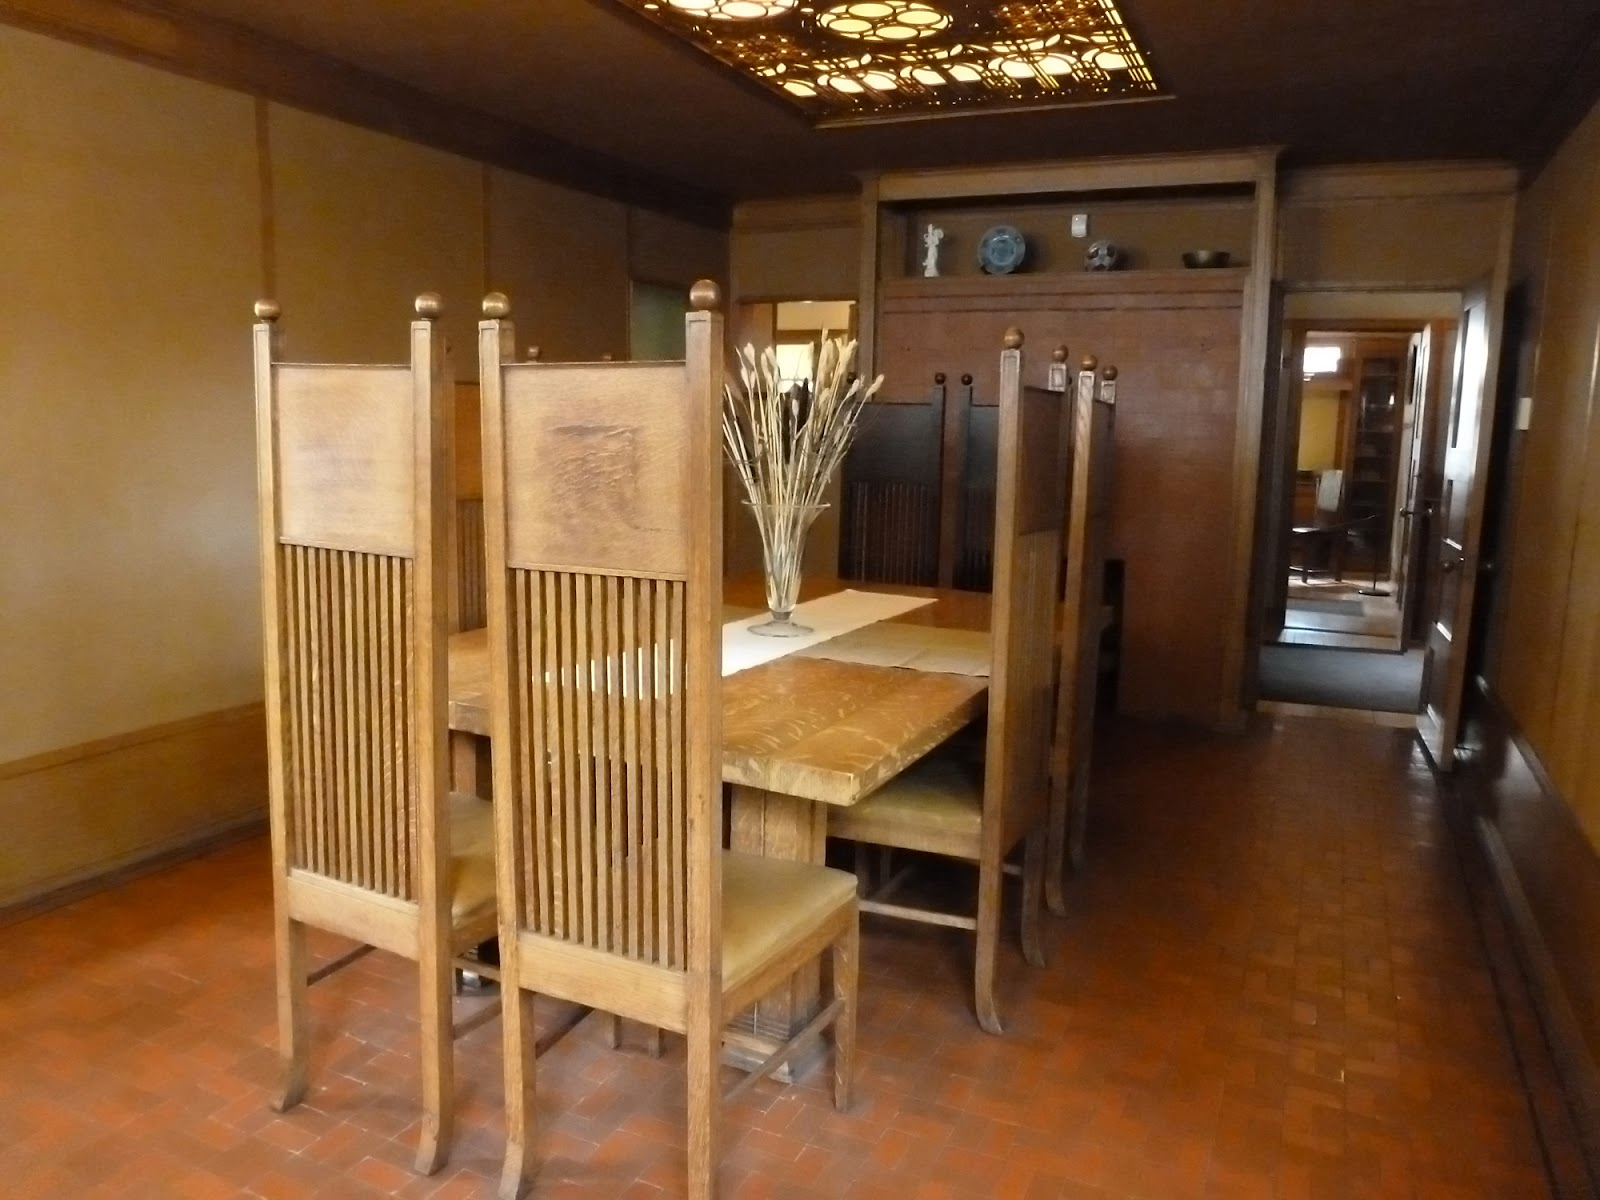 Frank Lloyd Wrightu0027s Laboratory Wasnu0027t Built For Comfort